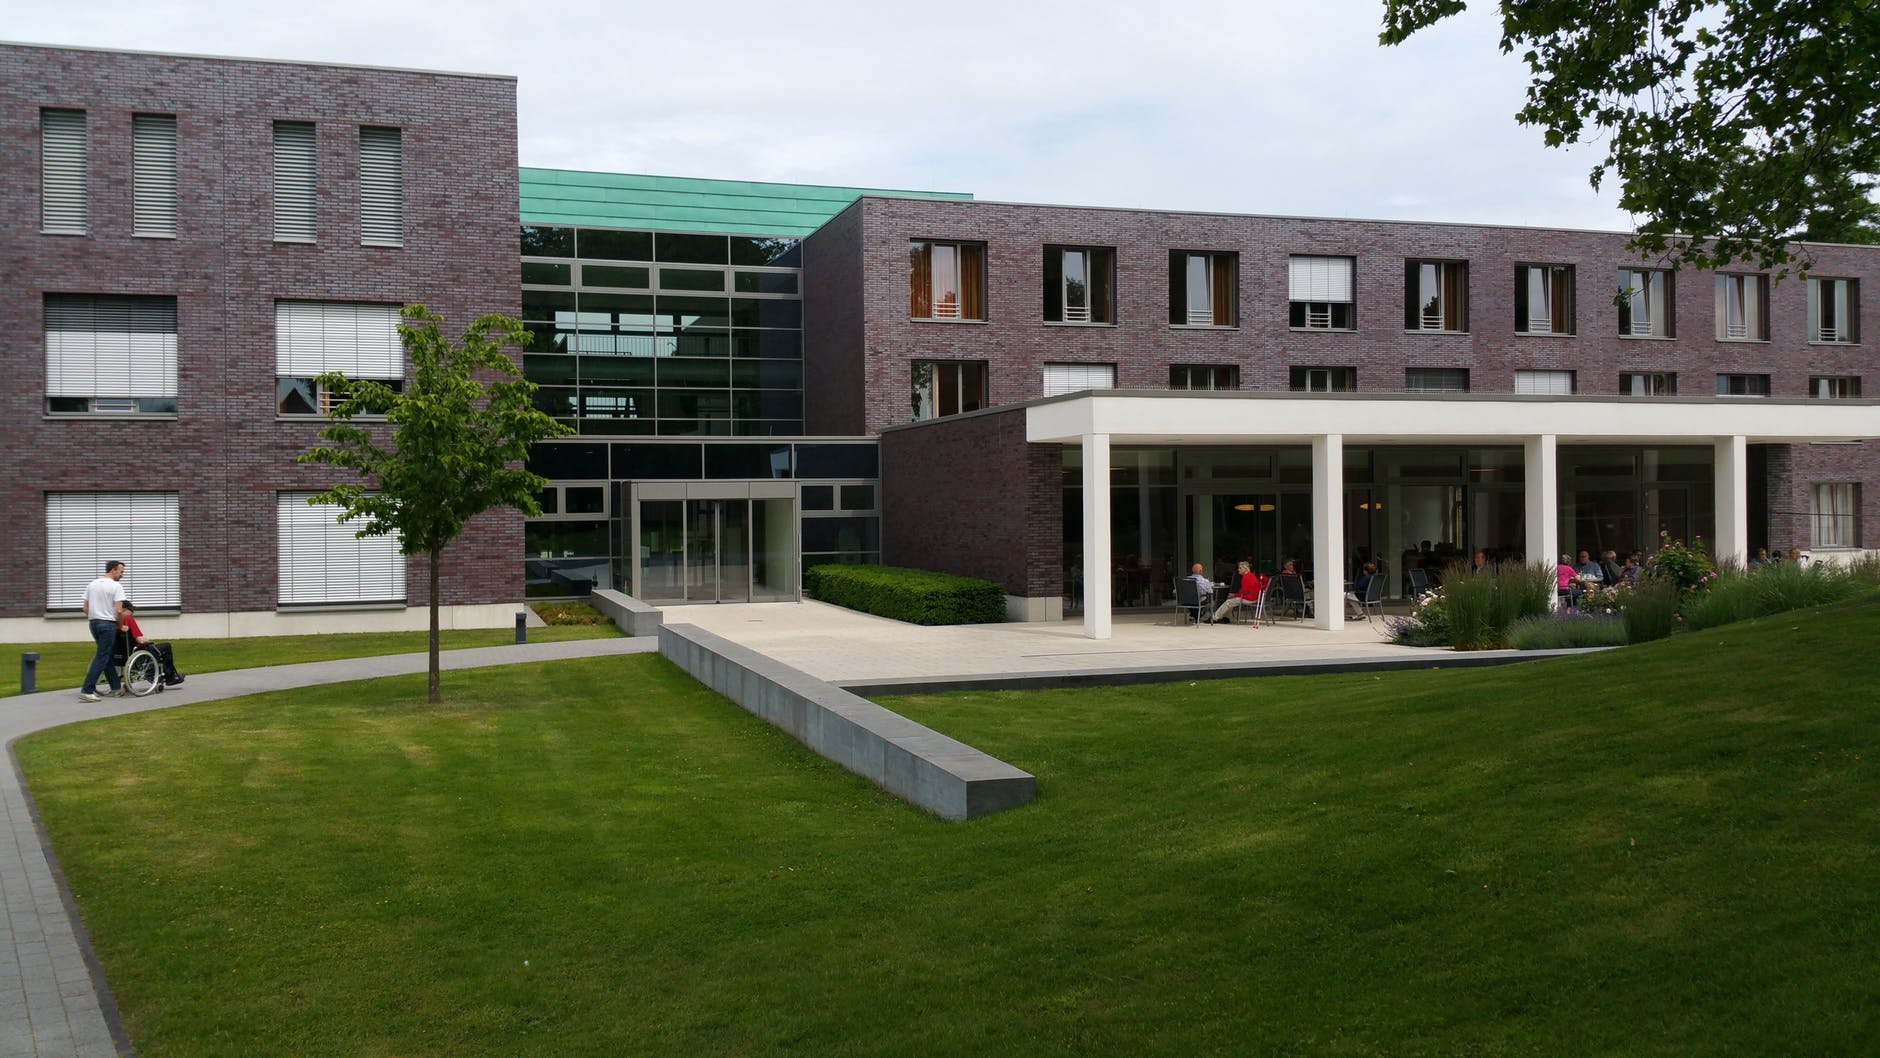 architecture buildings center clinic